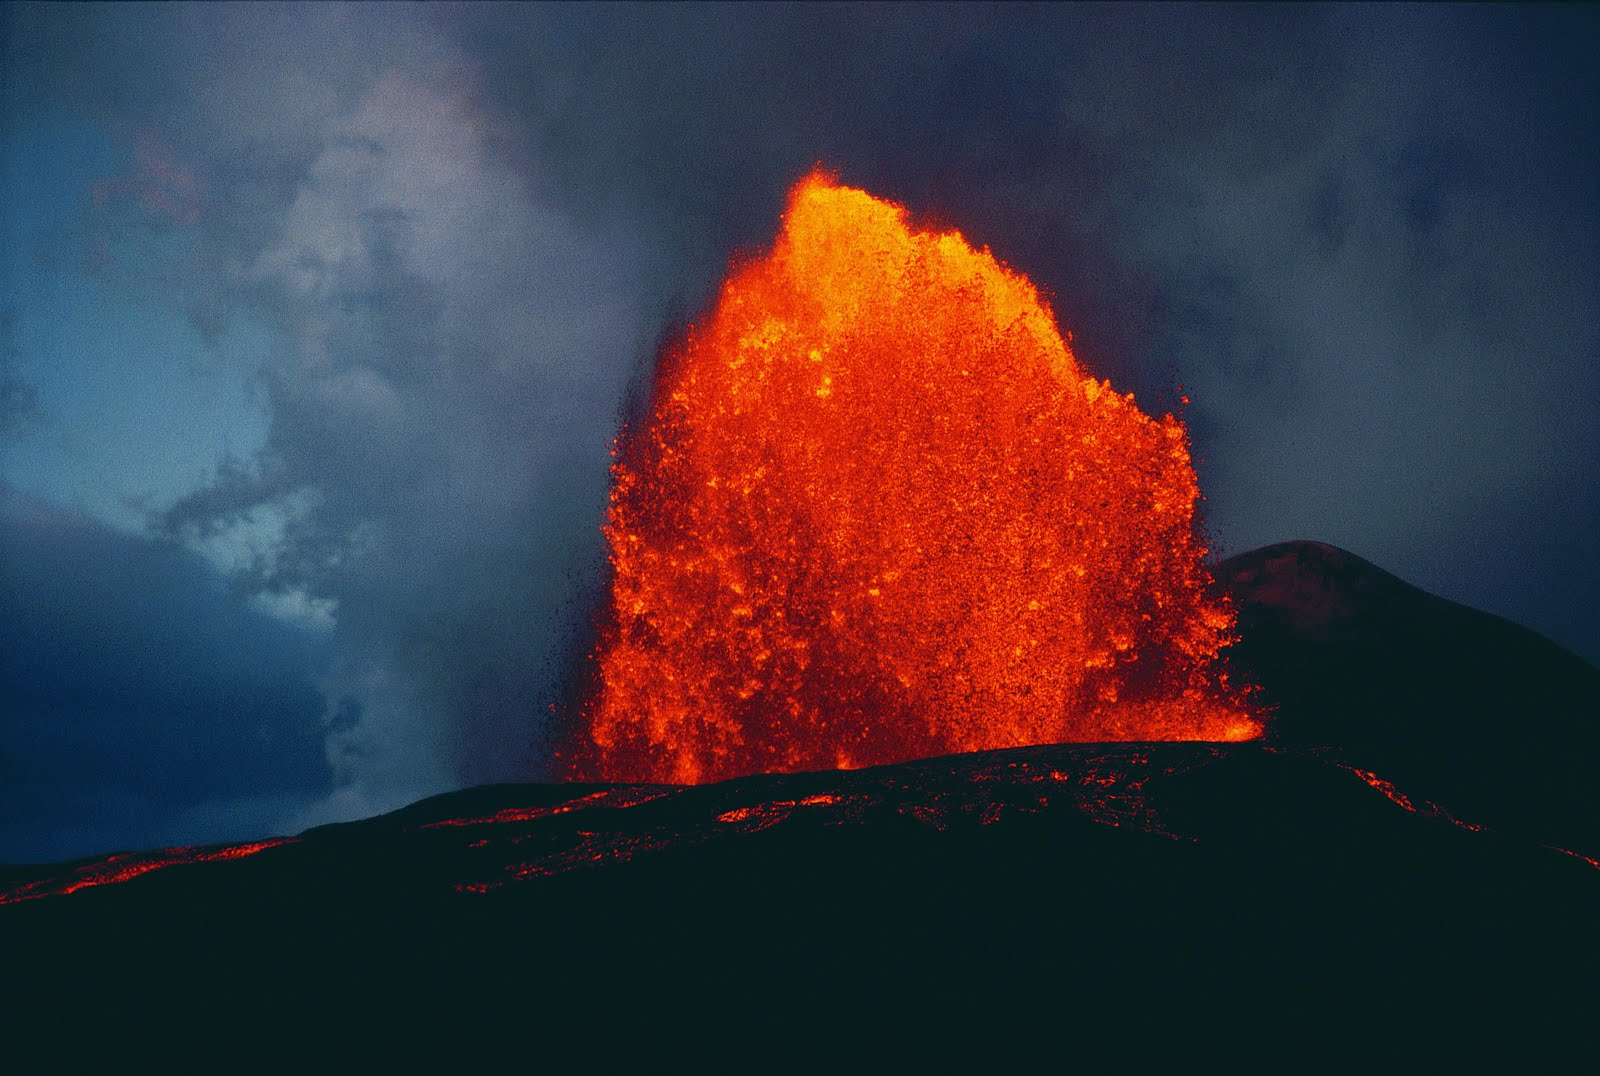 wallpaper hd volcano eruption - photo #17